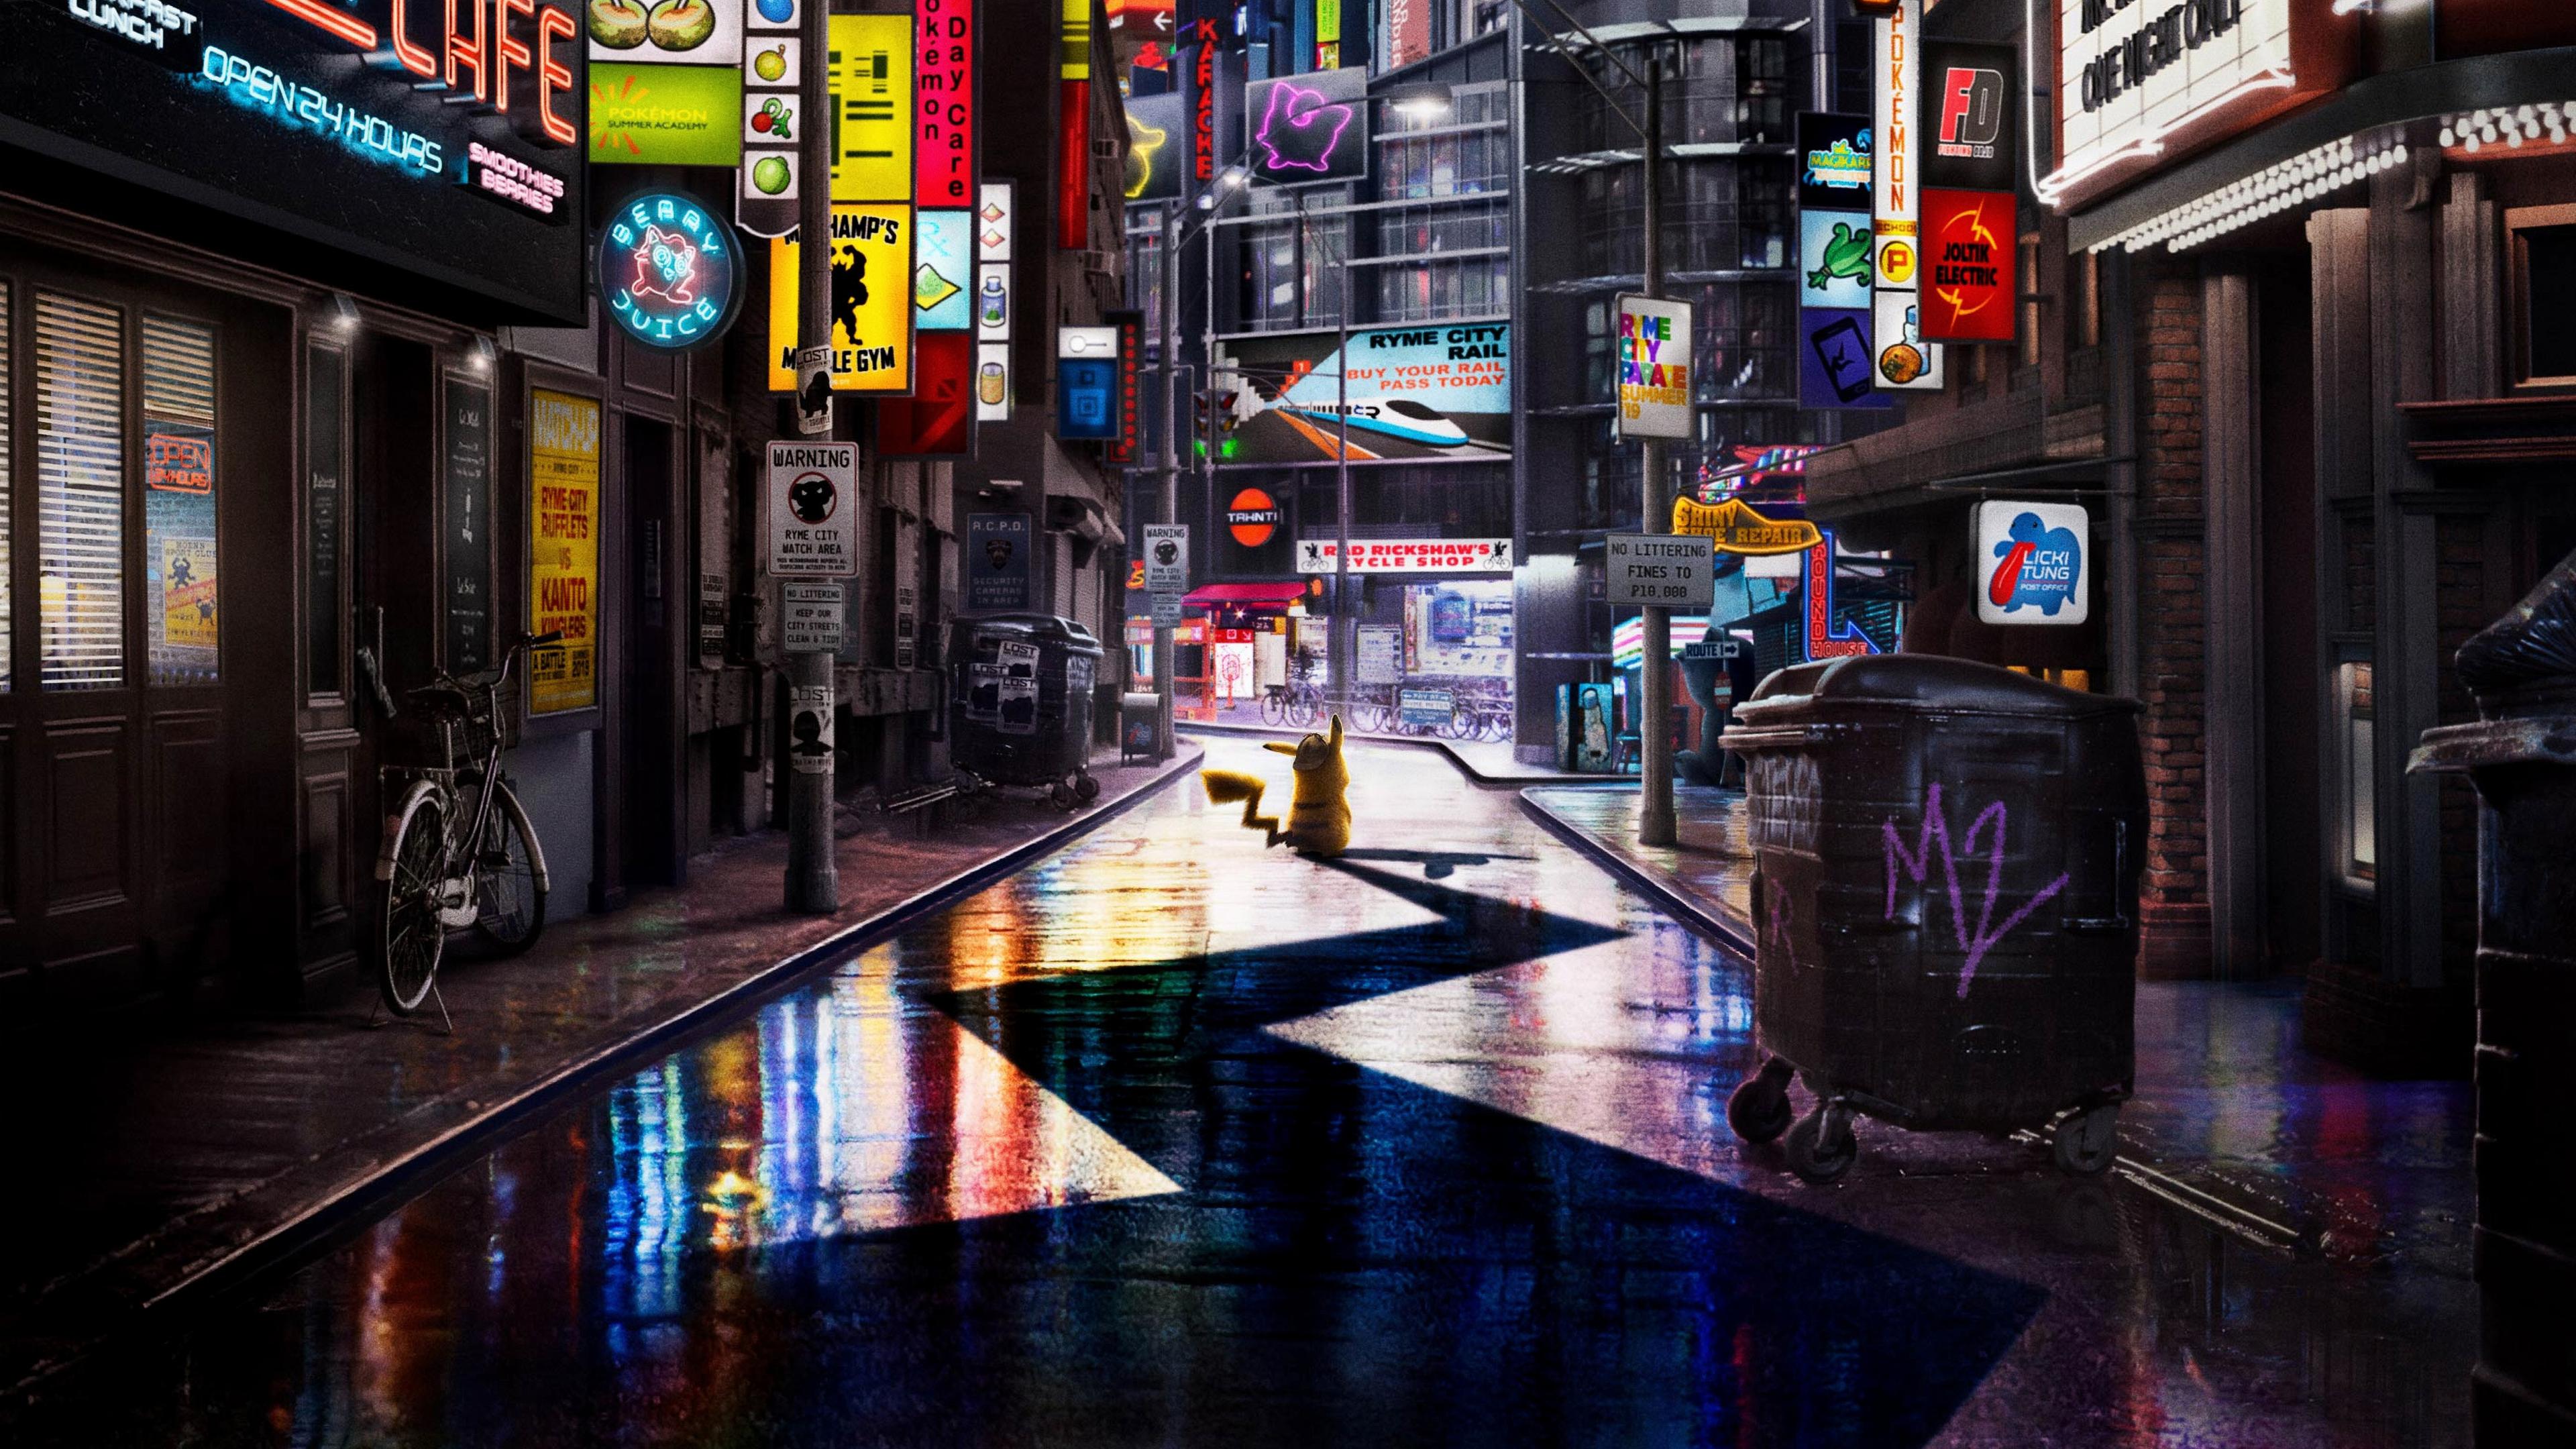 pokemon detective pikachu 4k 1543105544 - Pokemon Detective Pikachu 4k - pokemon detective pikachu wallpapers, movies wallpapers, hd-wallpapers, detective pikachu movie wallpapers, 8k wallpapers, 5k wallpapers, 4k-wallpapers, 2019 movies wallpapers